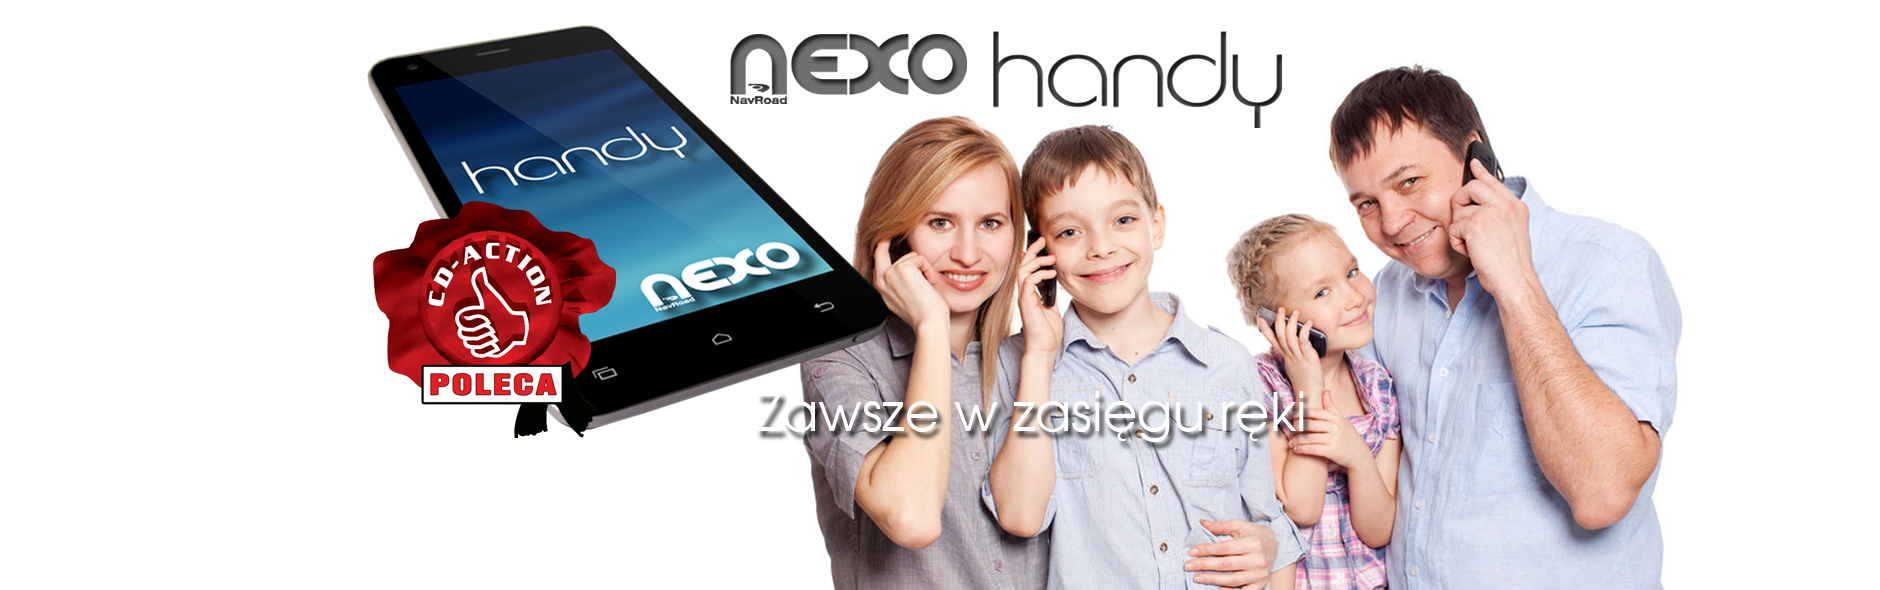 NEXO handy_banner CDA